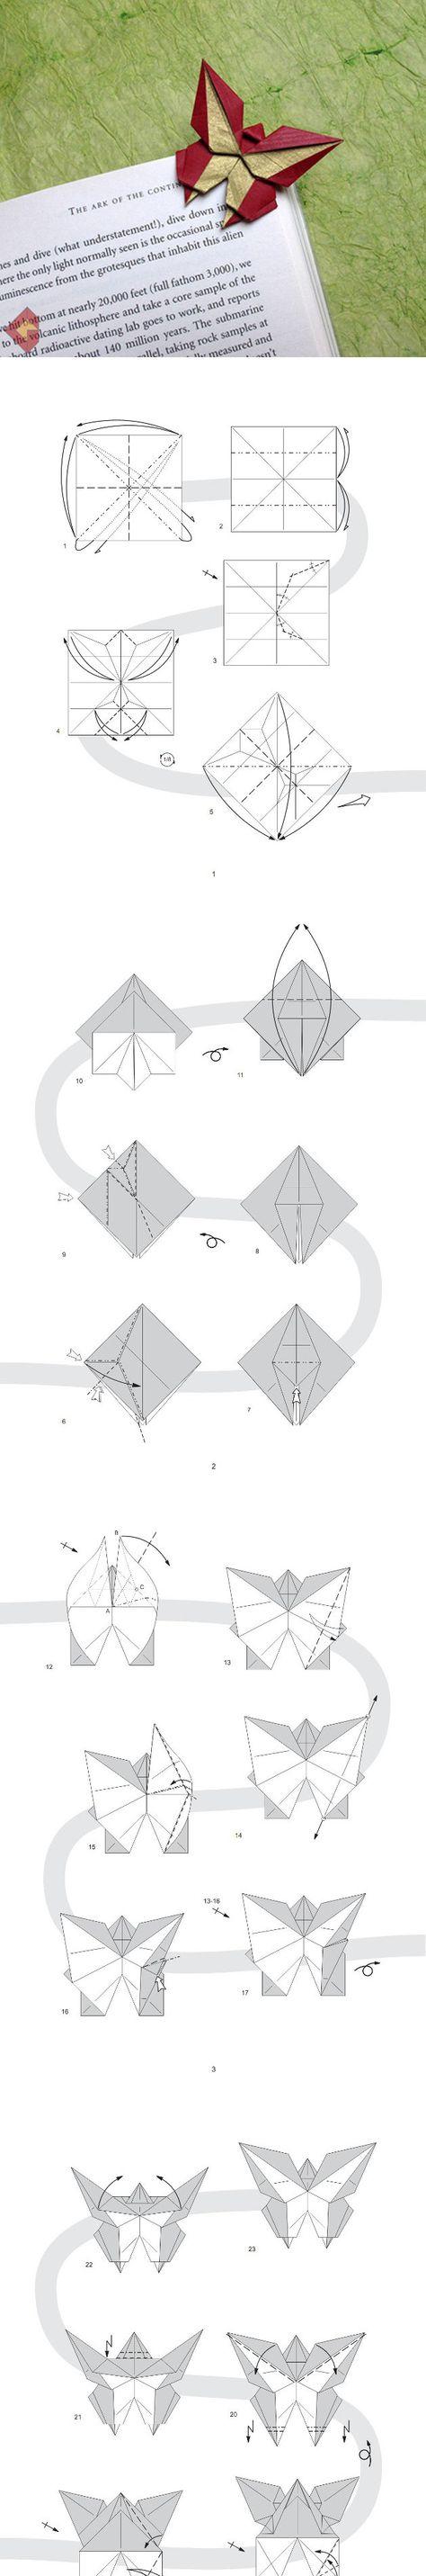 oragami book mark 折纸蝴蝶书签